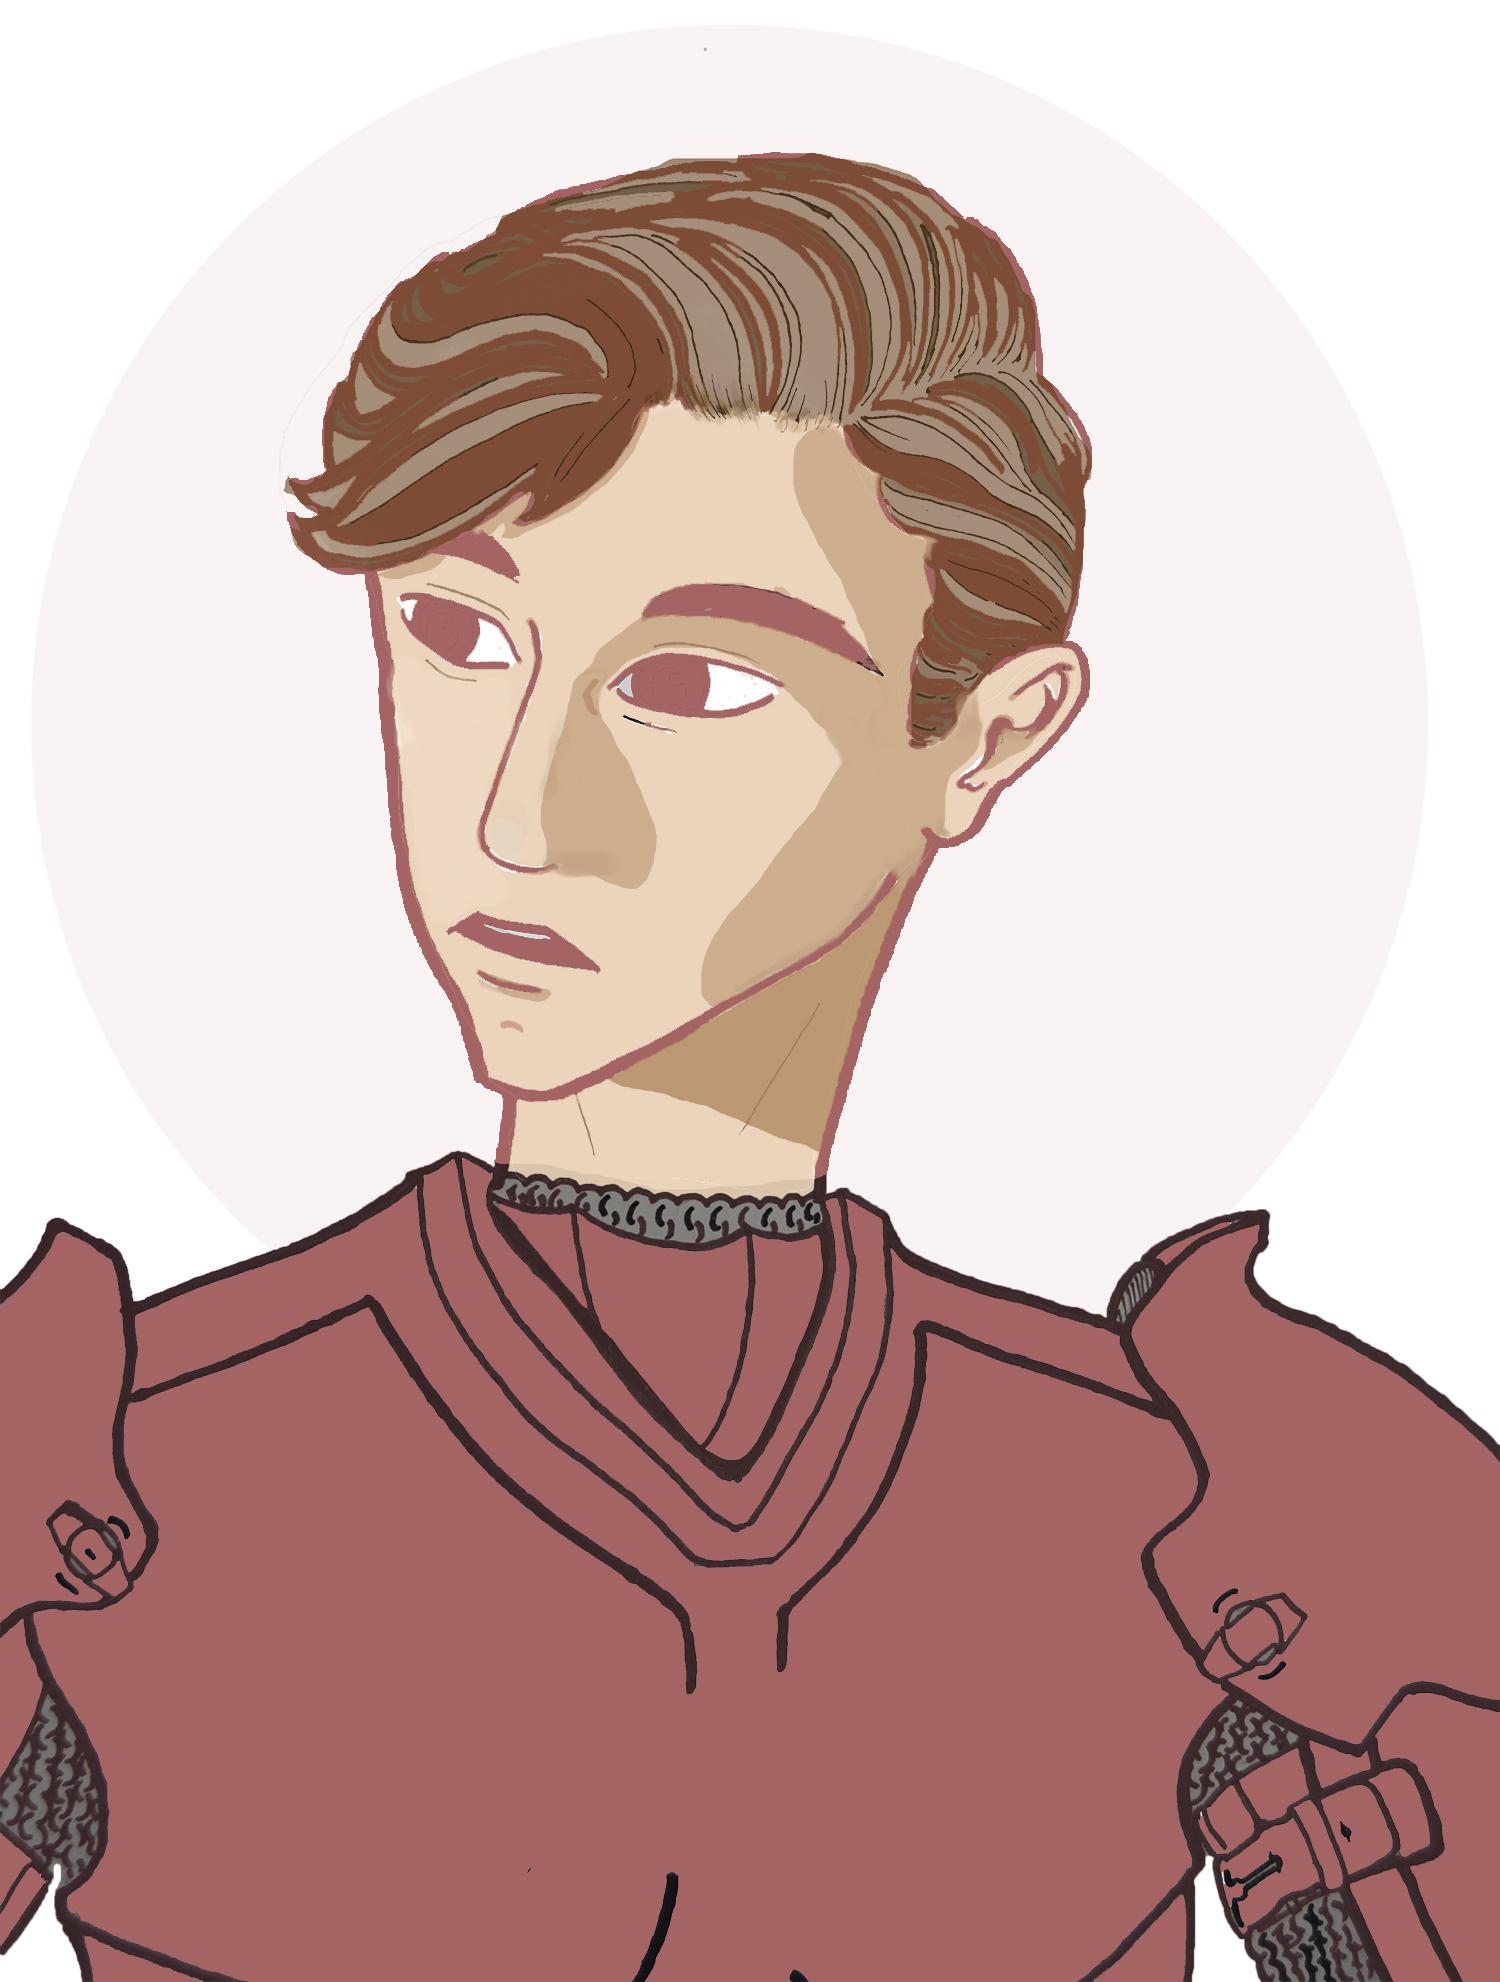 Royalty (arte edit)